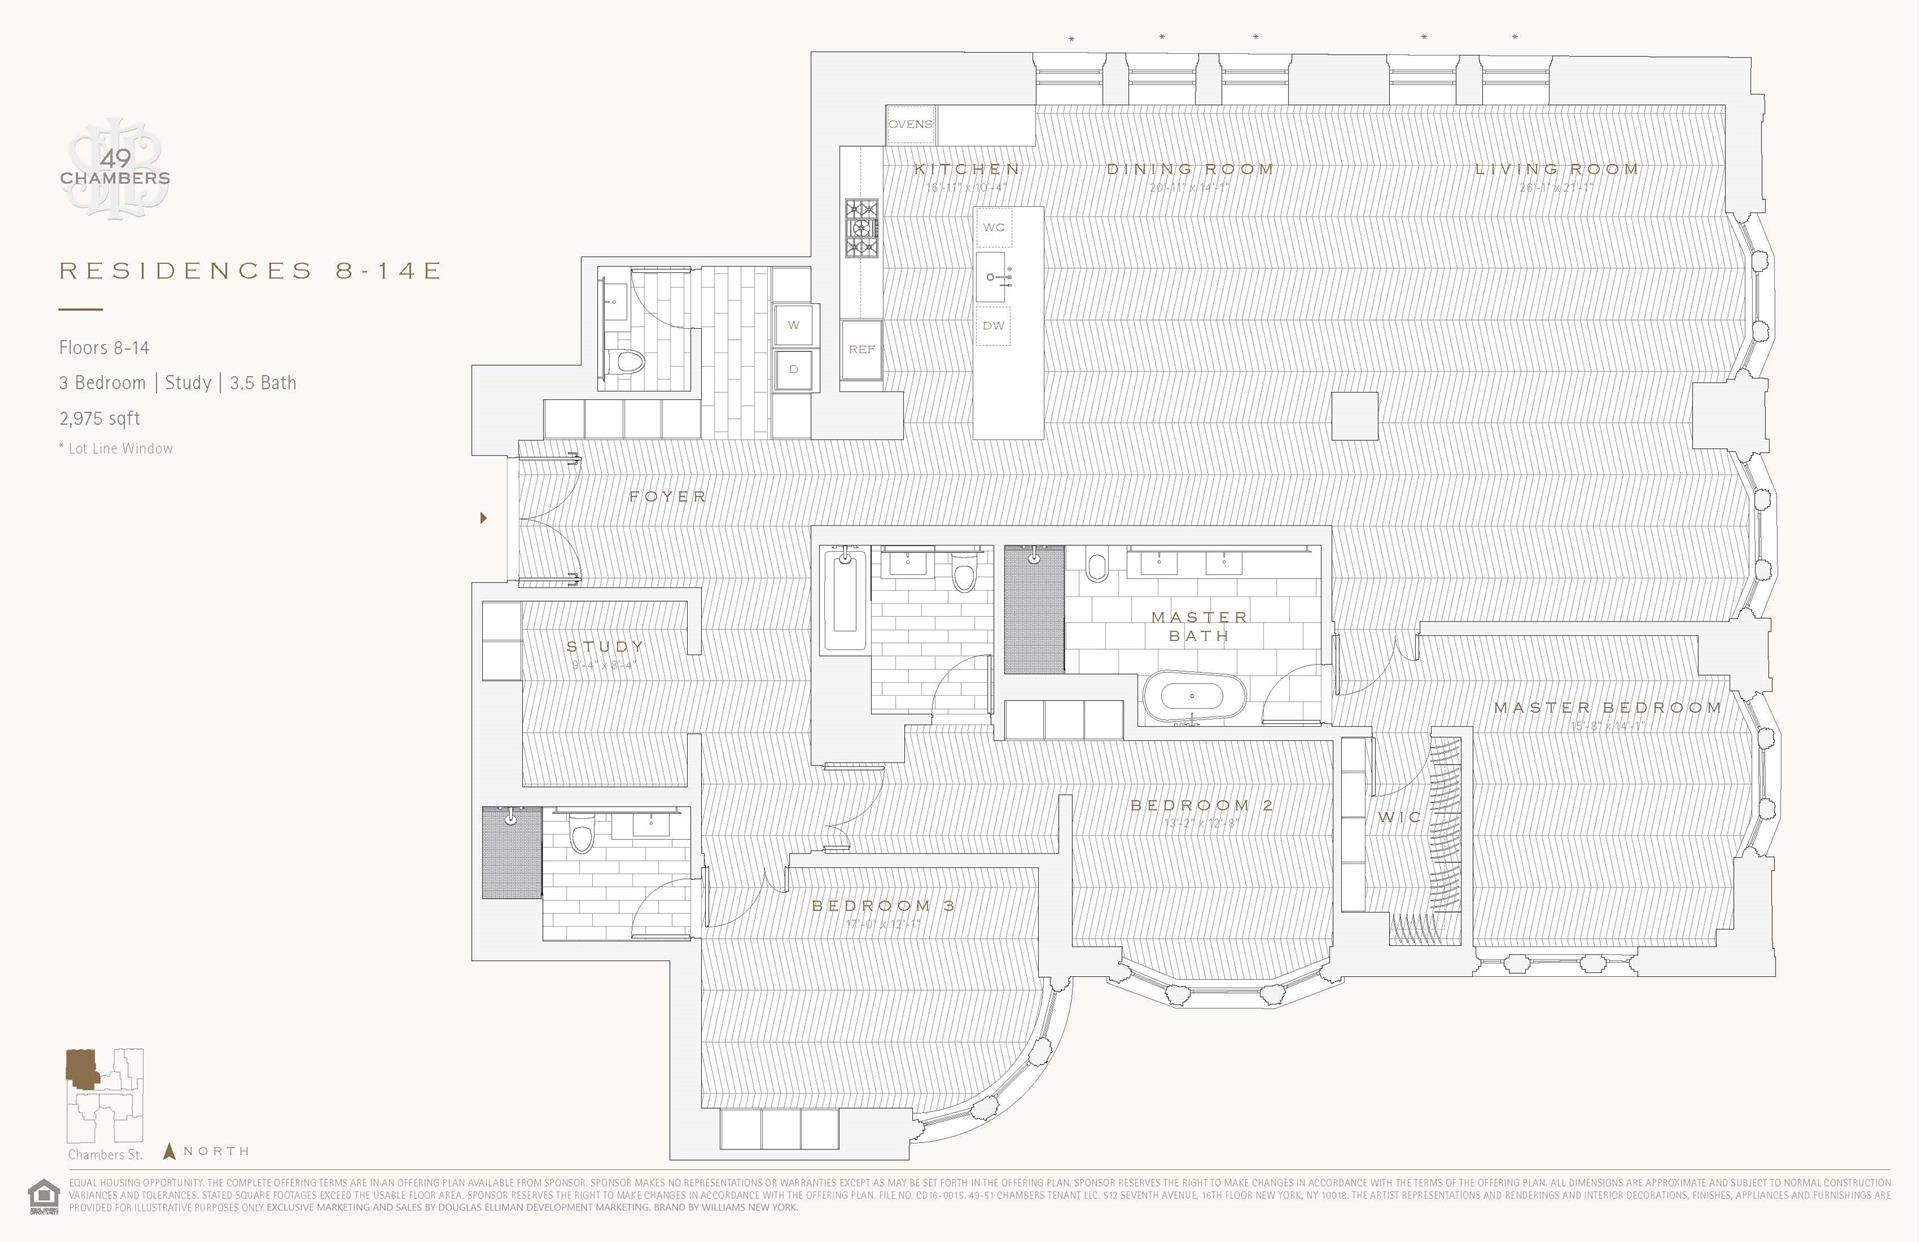 Floor plan of 49 Chambers St, 9E - TriBeCa, New York